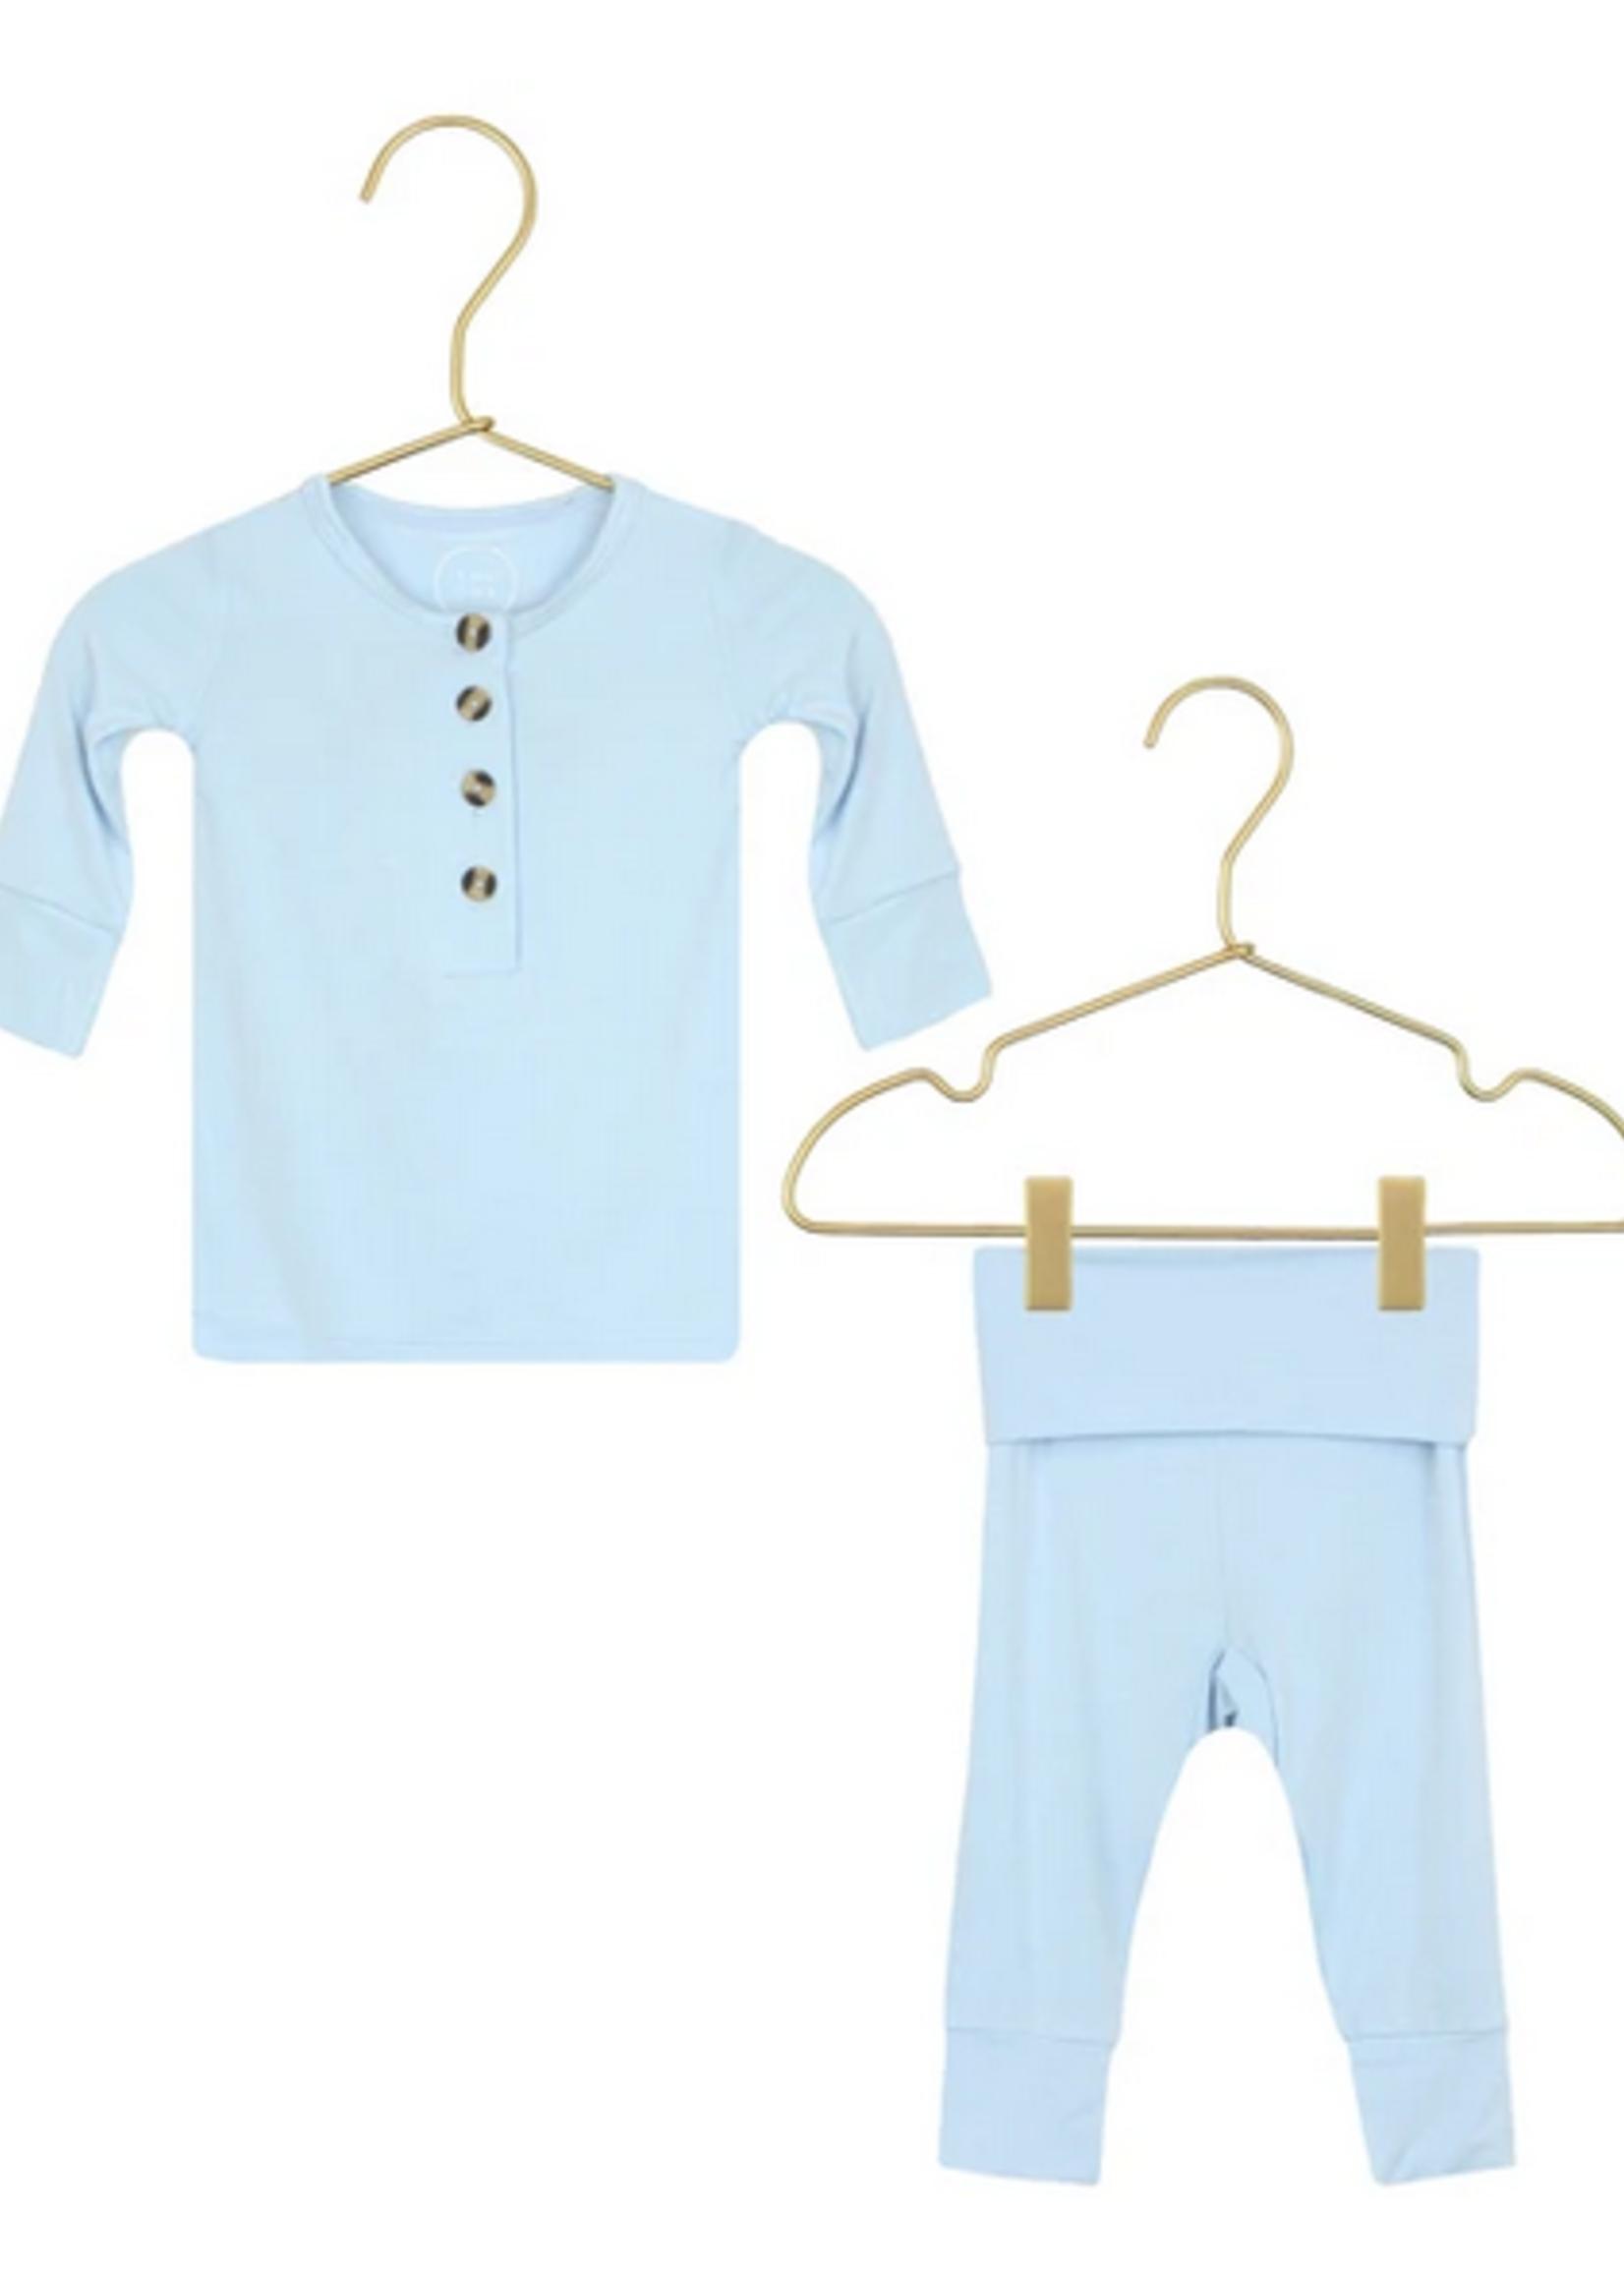 Elitaire Petite Jude Baby Blue Set 3-6Months